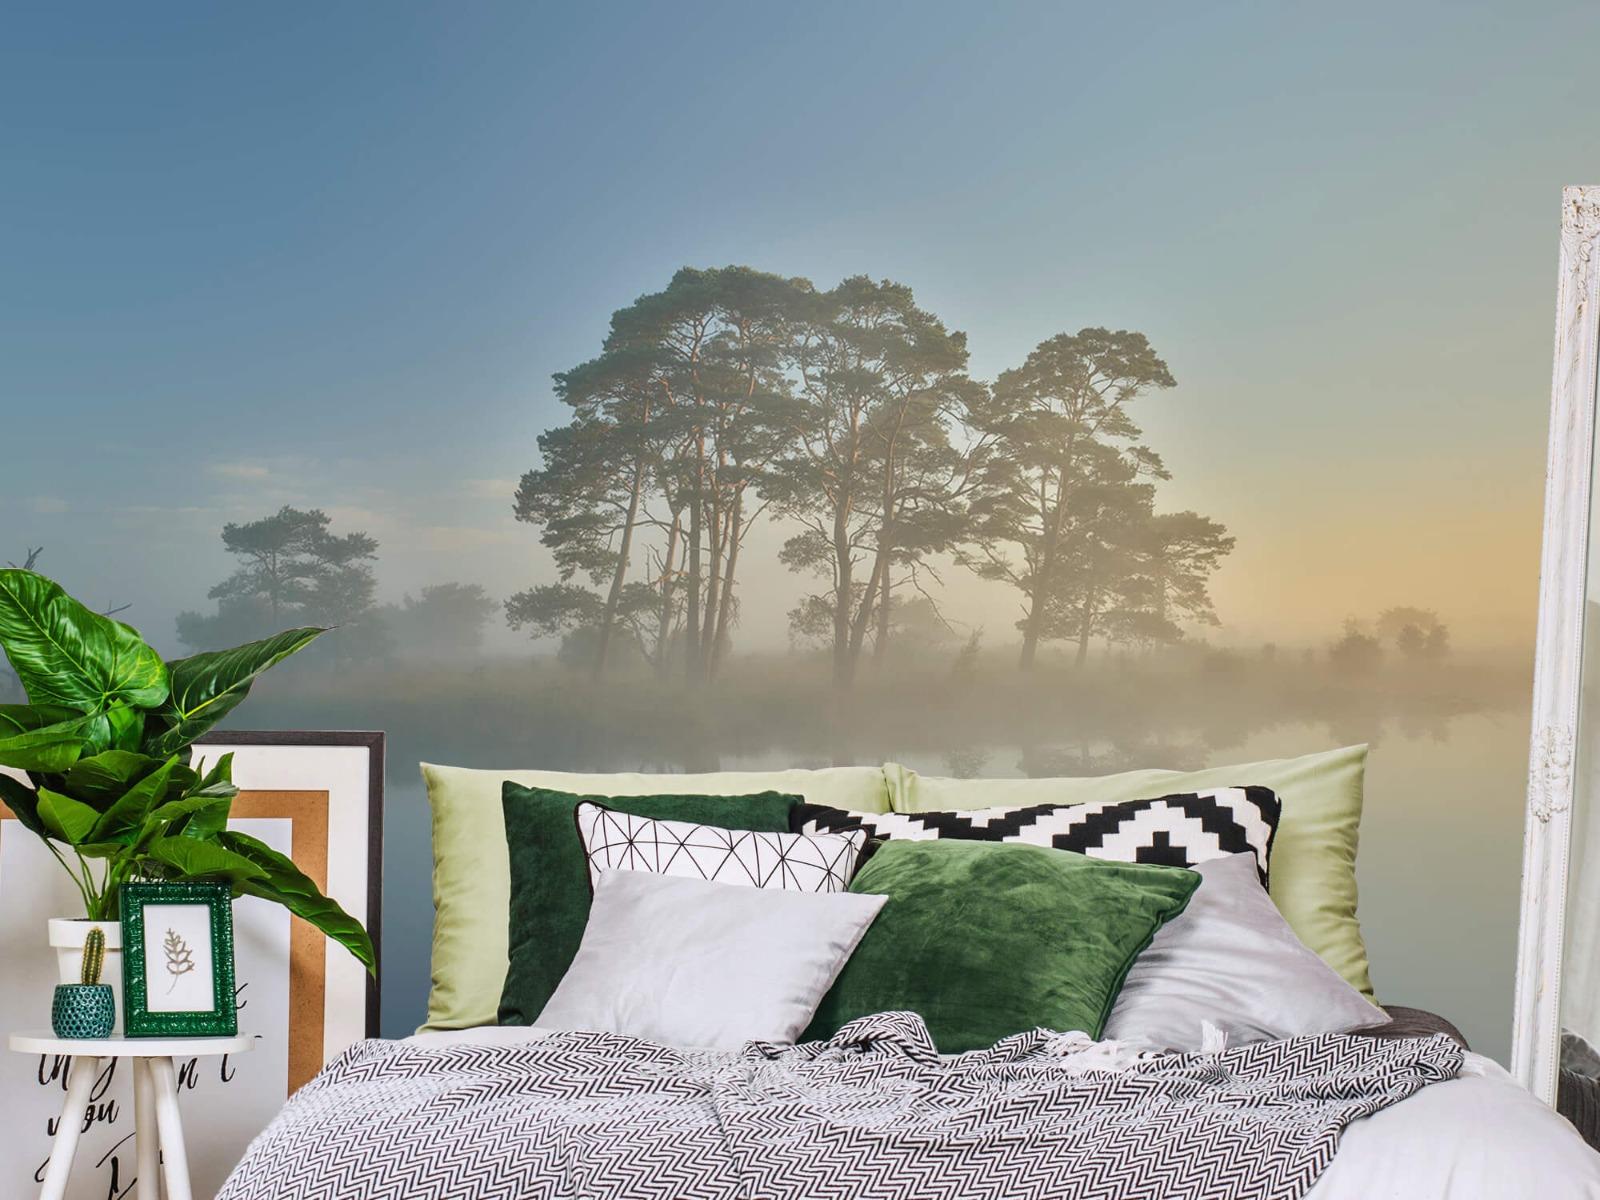 Natuur - Mist in heidegebied 2